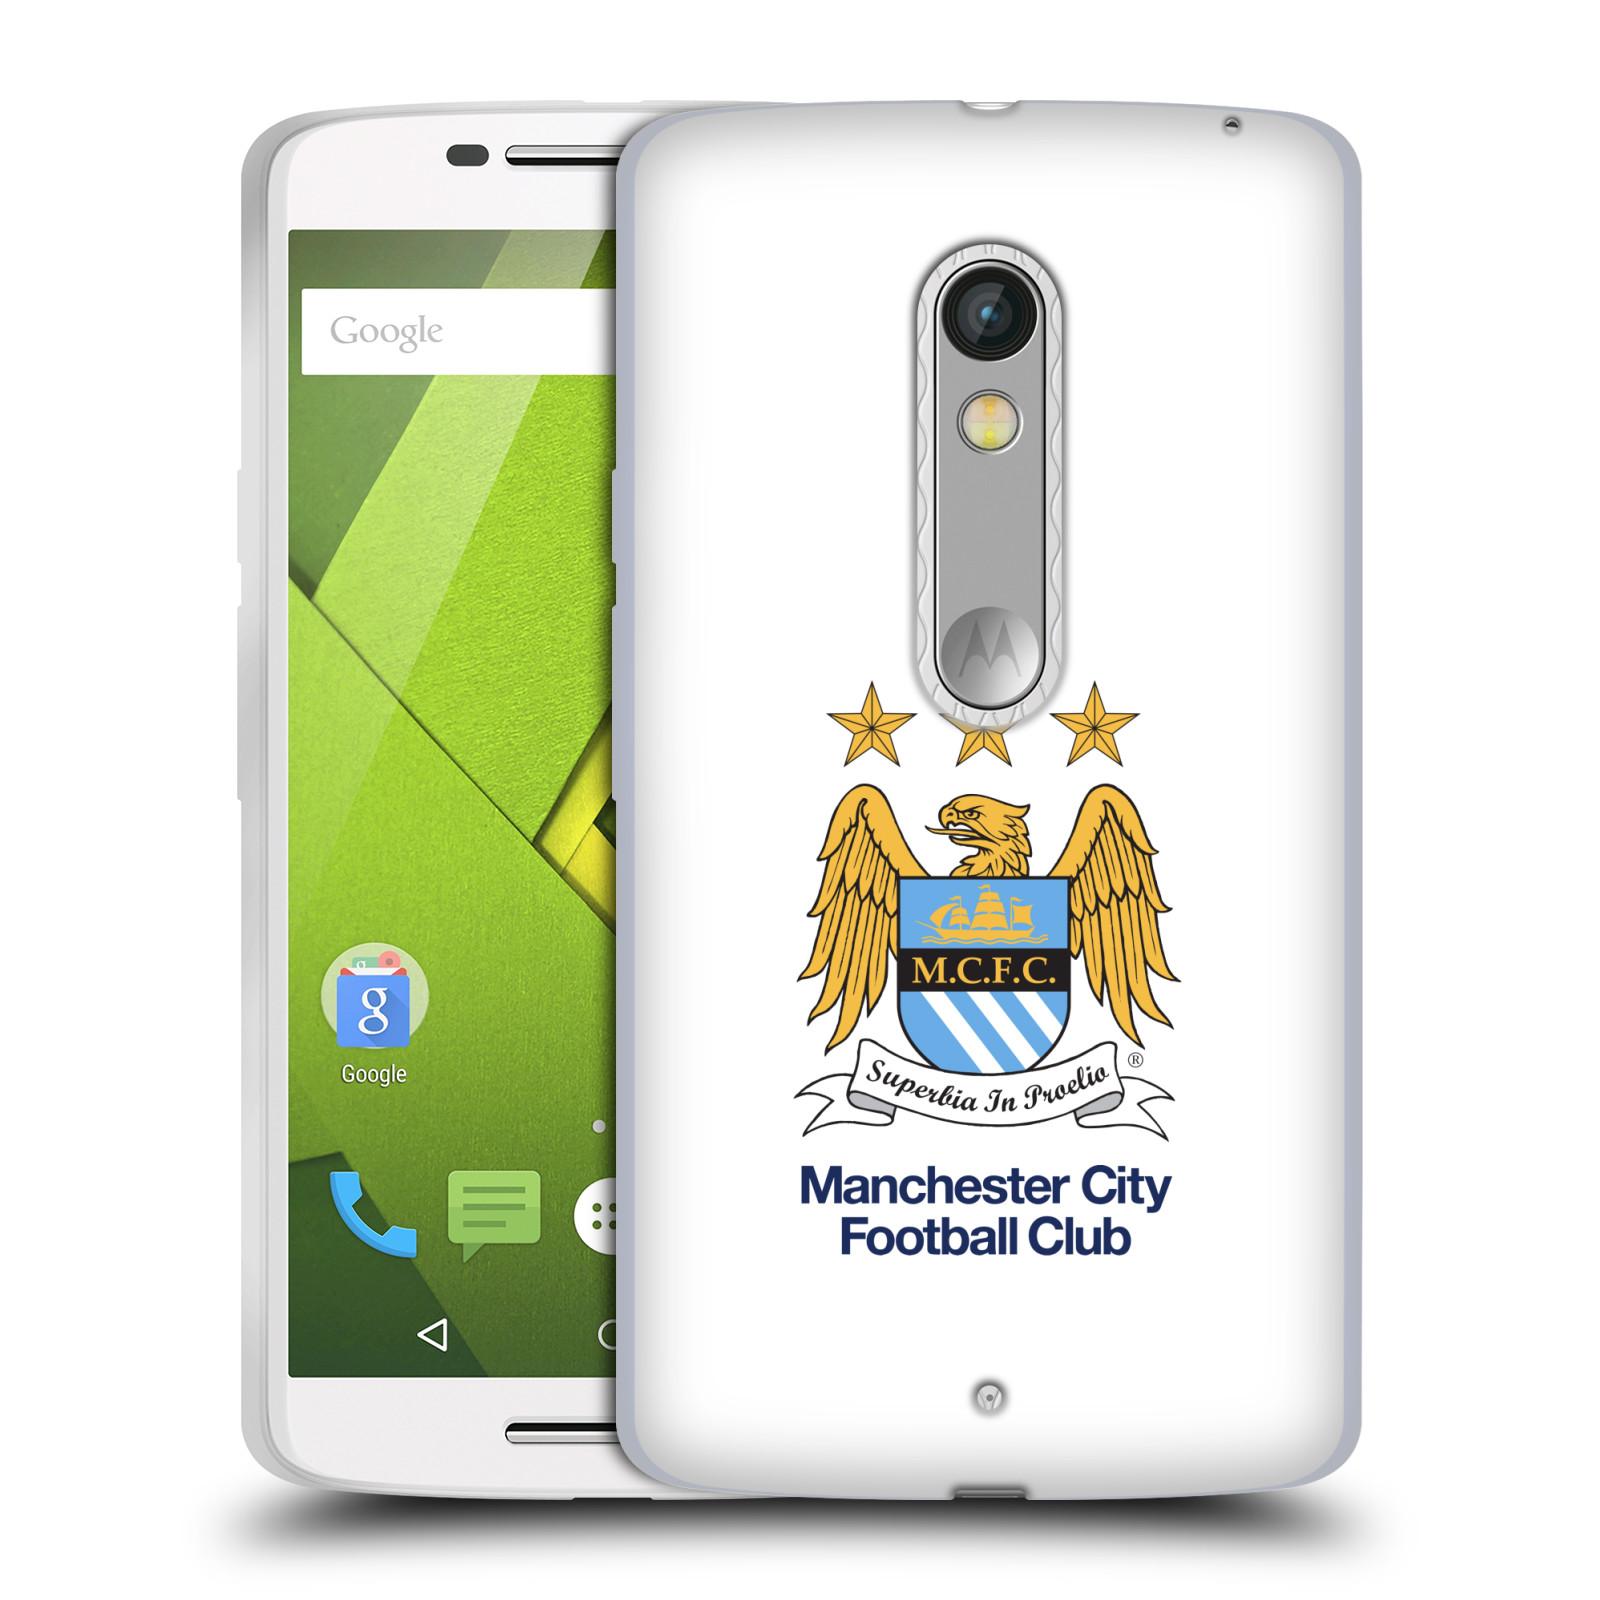 HEAD CASE silikonový obal na mobil Lenovo Moto X PLAY Fotbalový klub Manchester City bílé pozadí velký znak pták